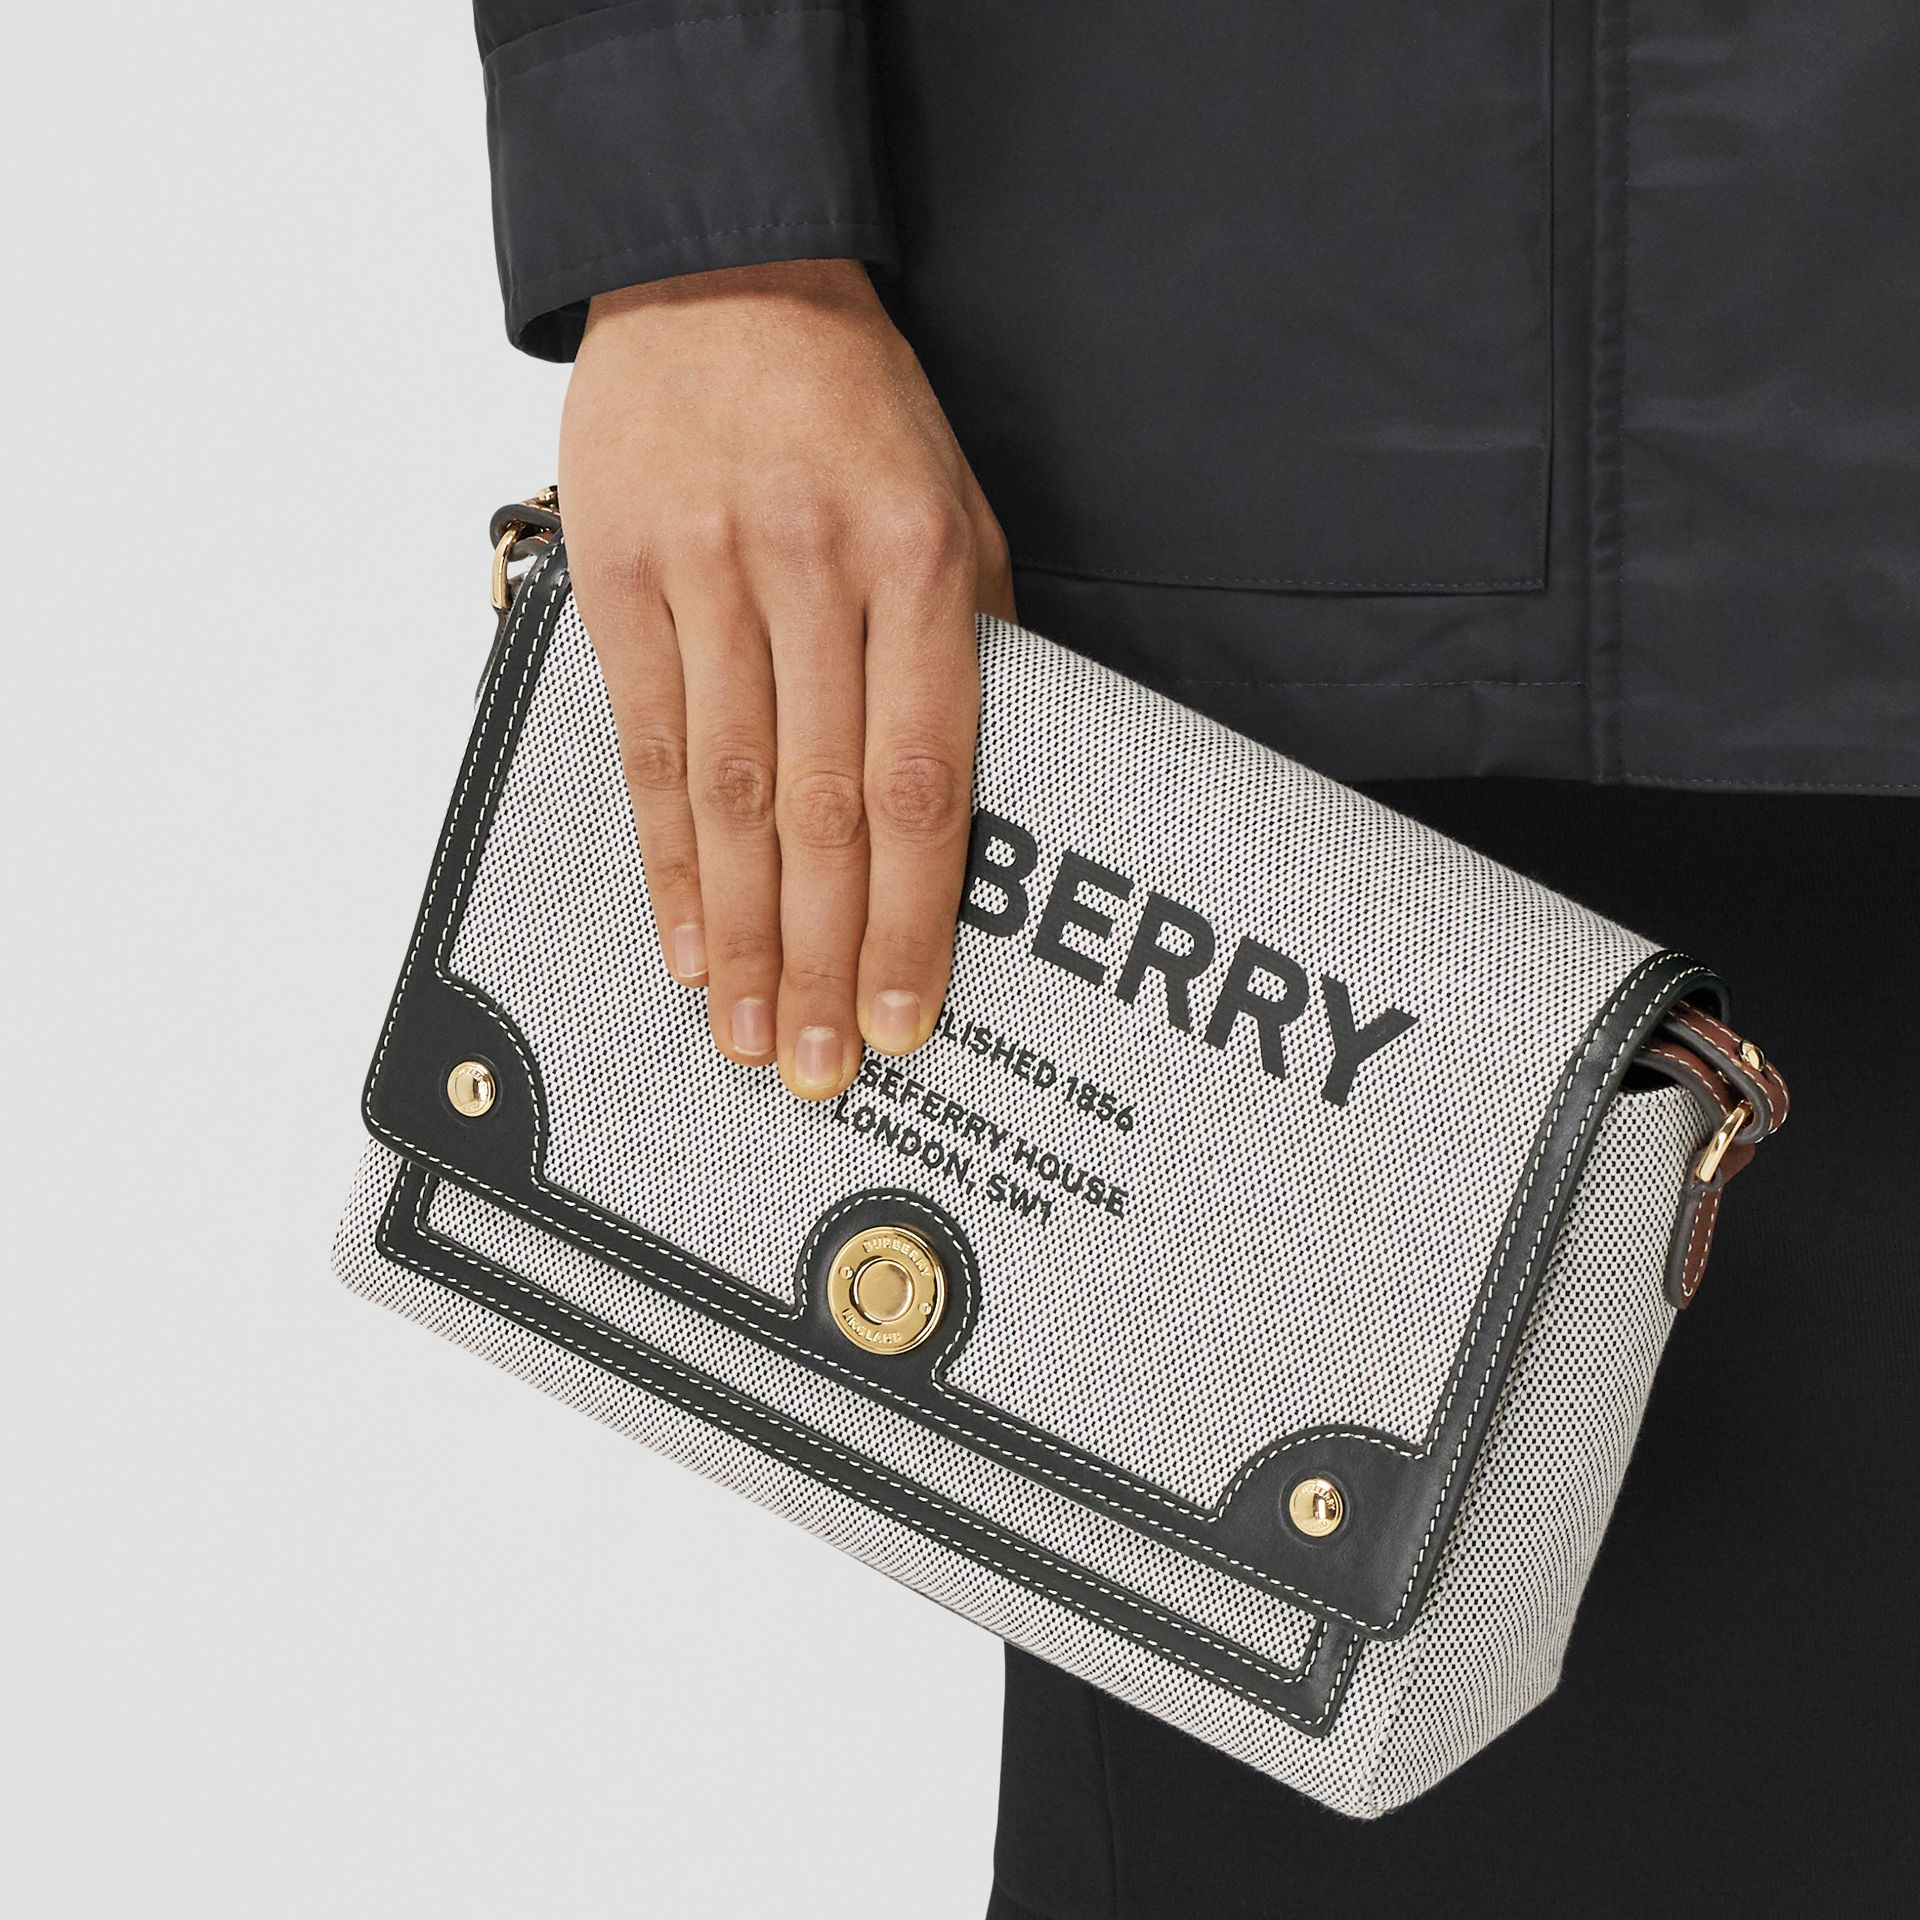 Horseferry Print Canvas Note Crossbody Bag in Black/black/tan - Women | Burberry - gallery image 9